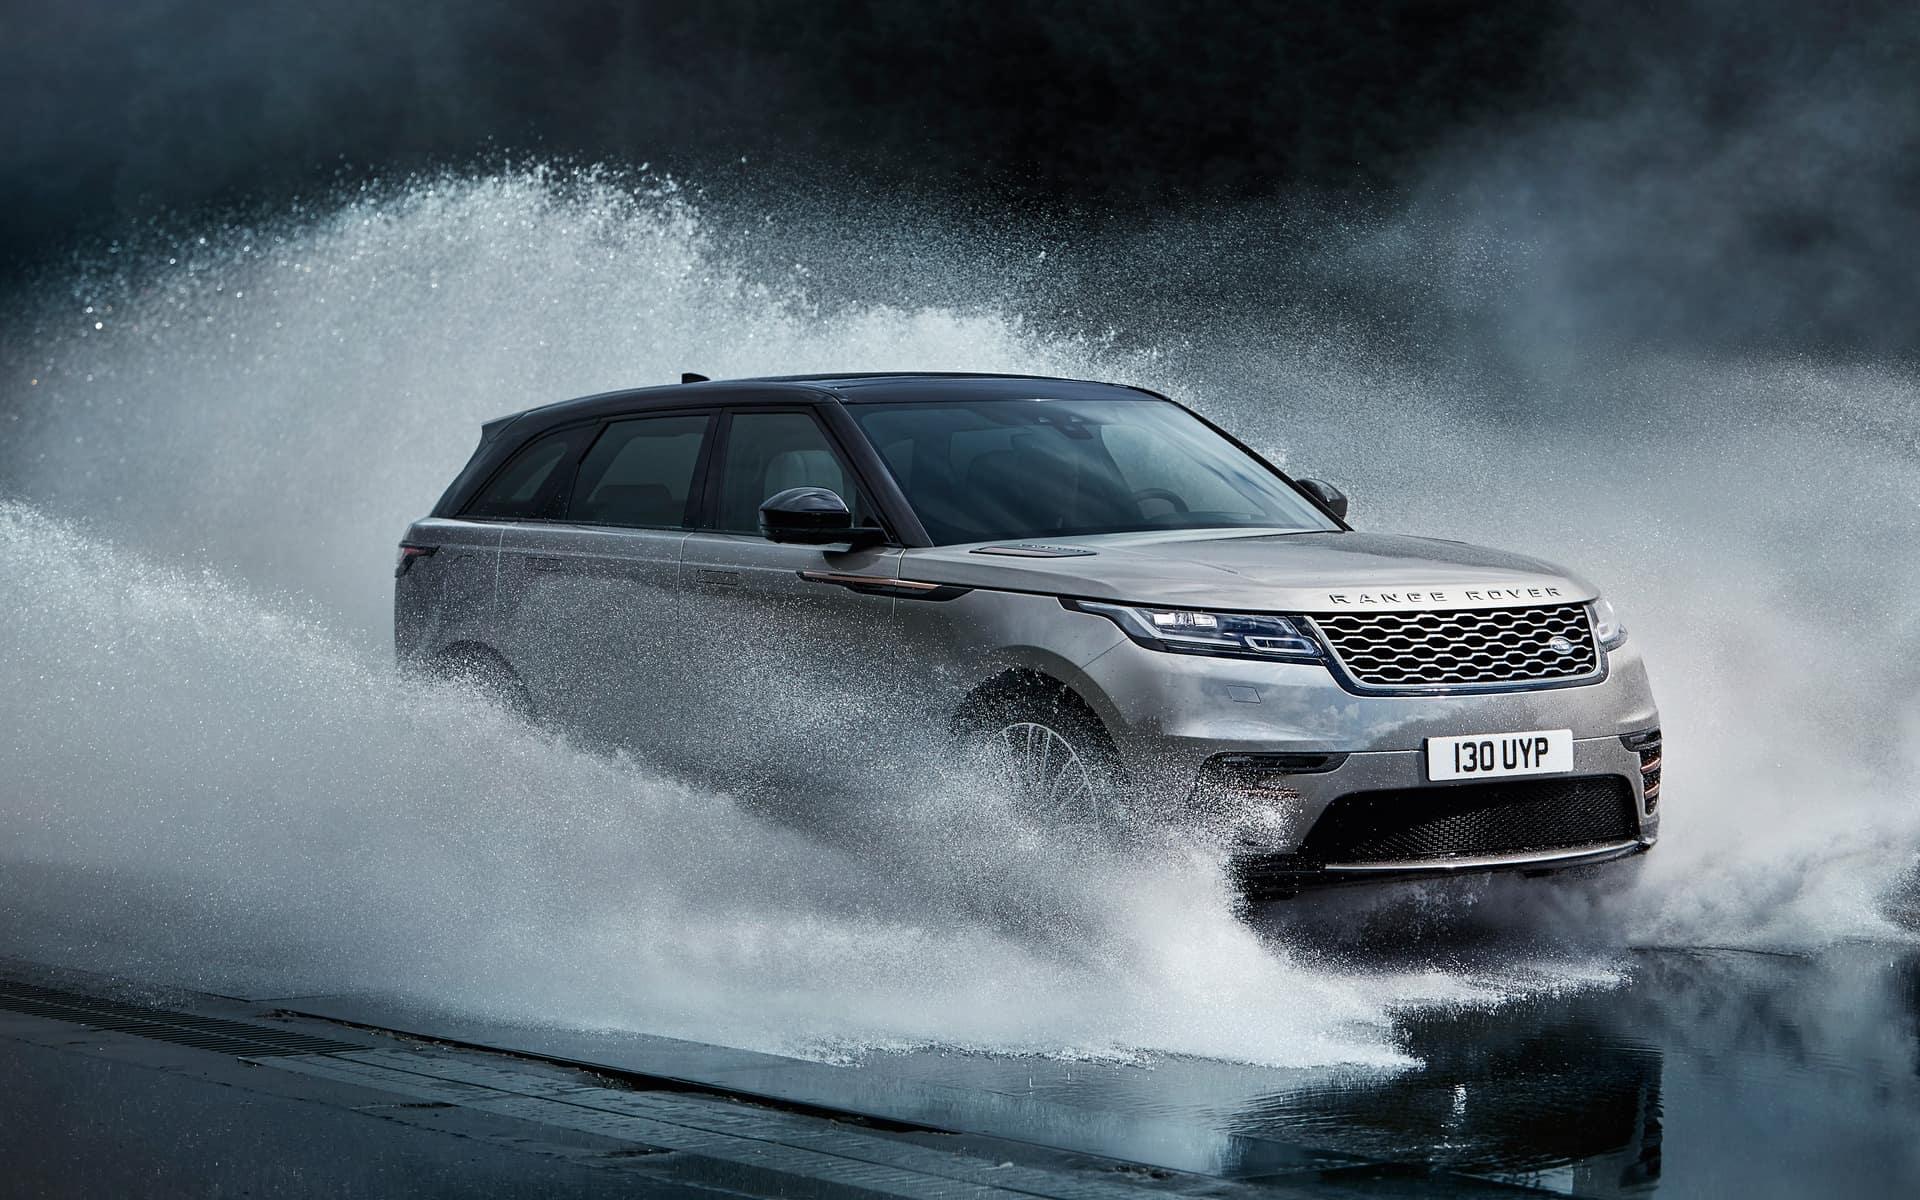 Range Rover, Land Rover, Velar, Conquest Cash